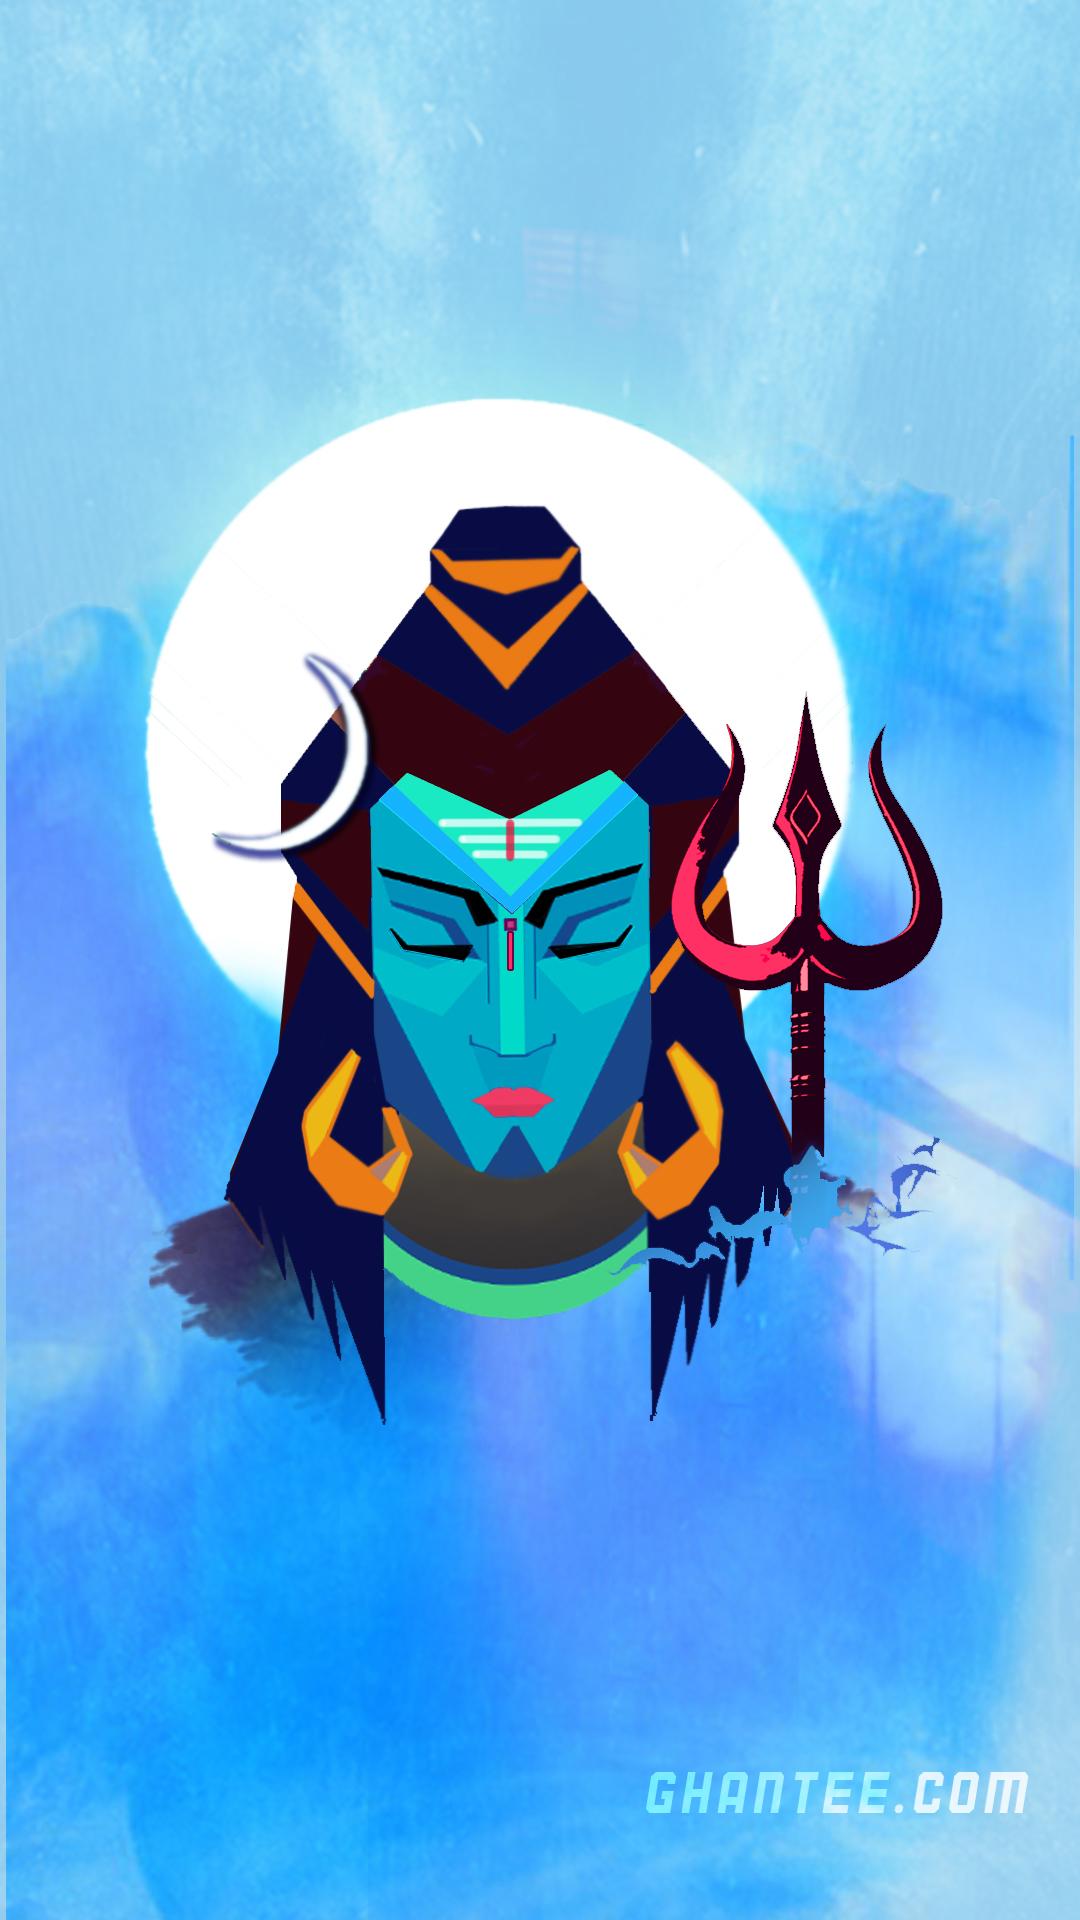 lord shiva abstract art hd mobile wallpaper